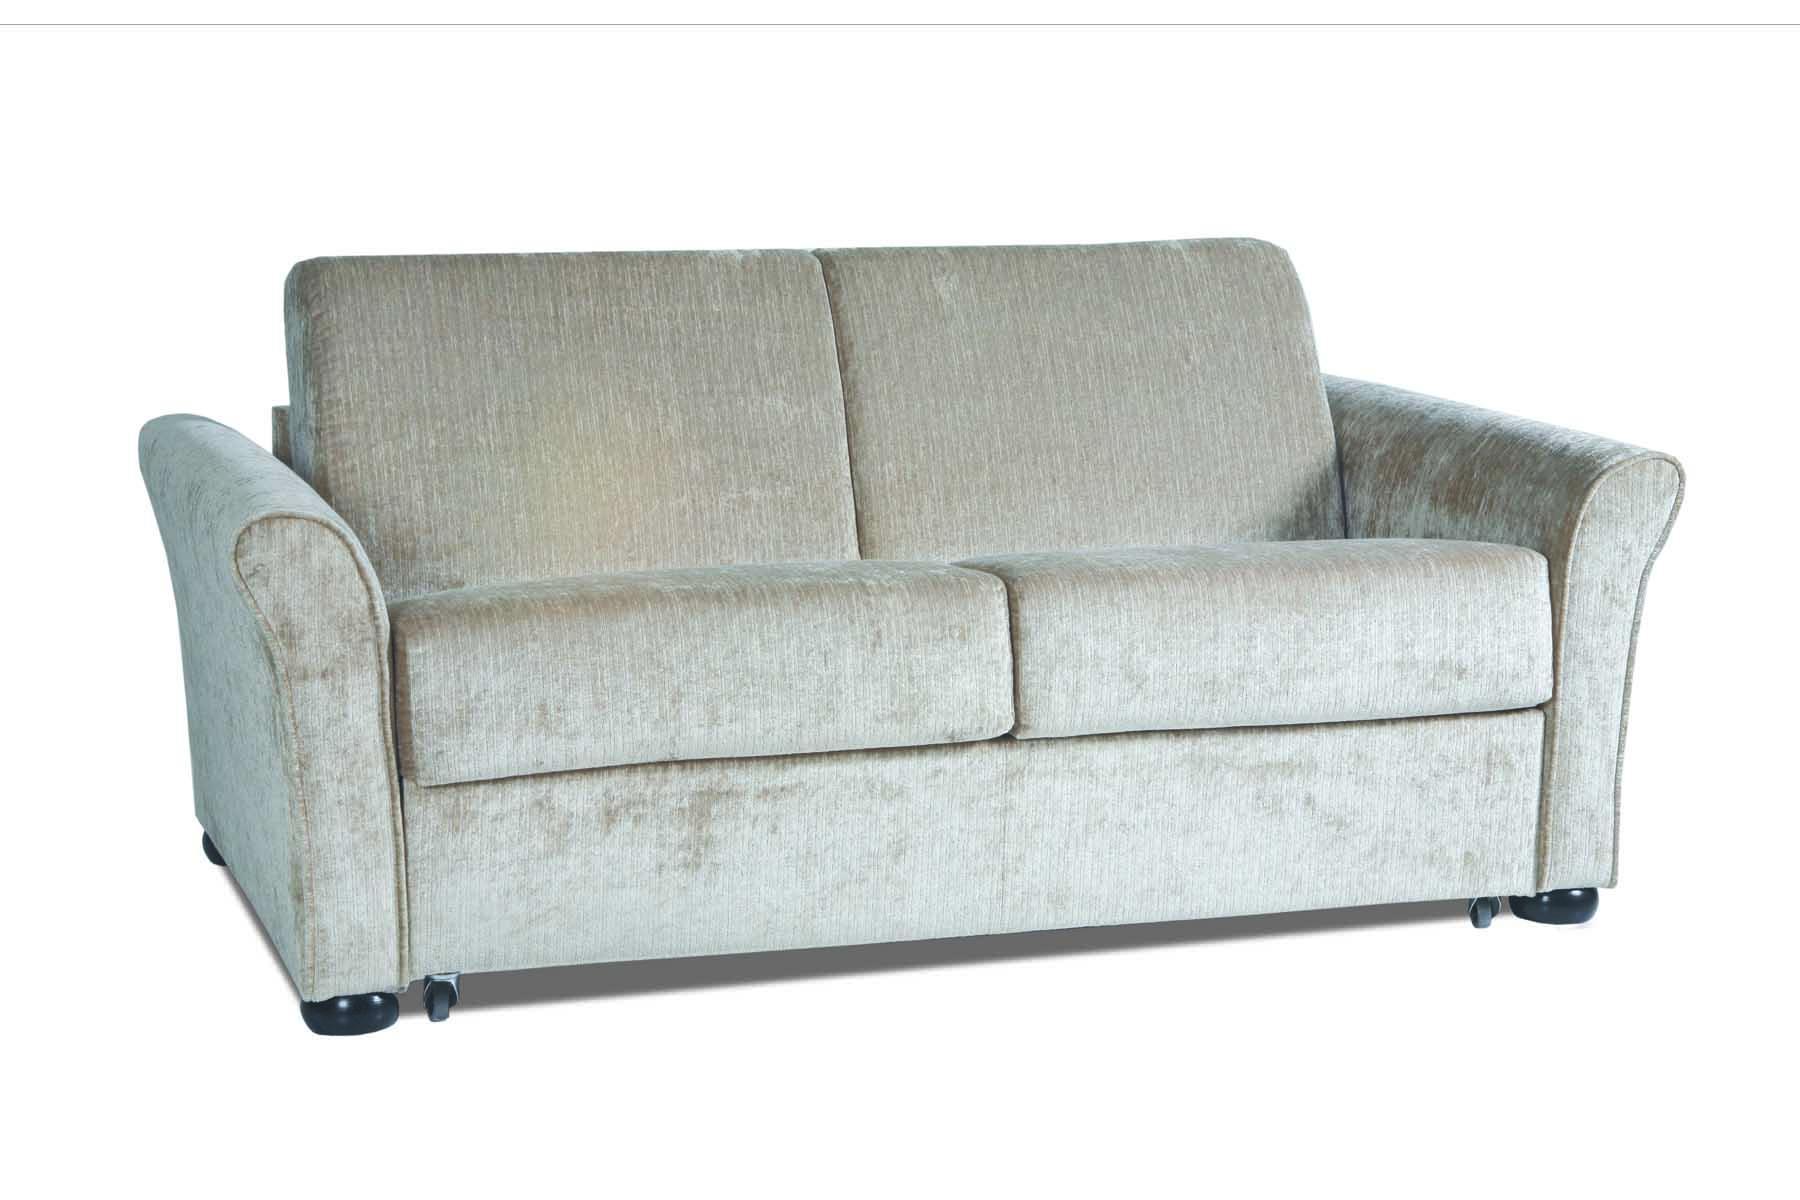 Daytona Suede Sofa Bed